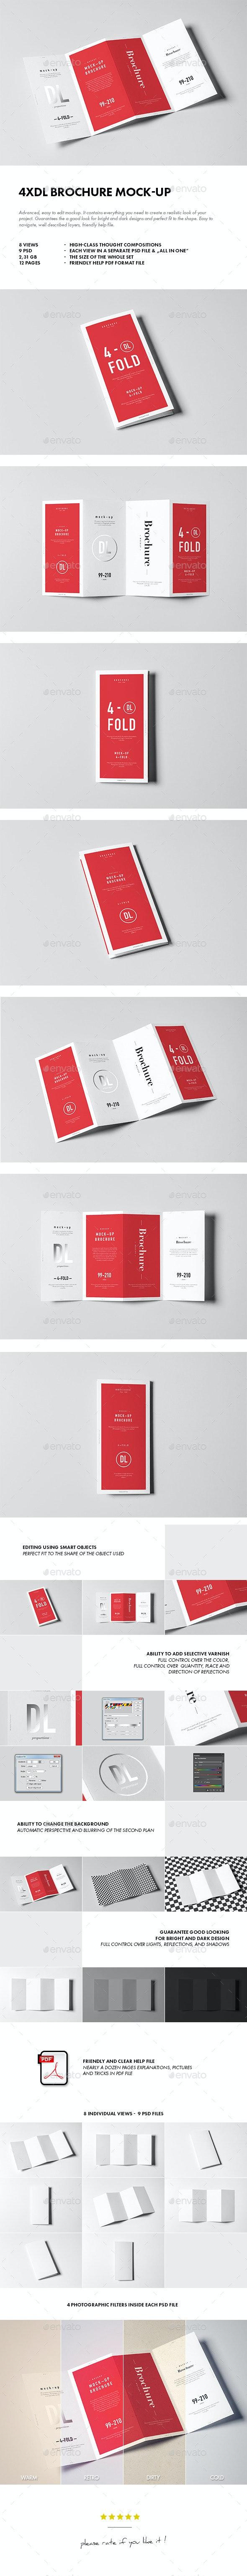 4xDL Brochure Mock-up - Brochures Print